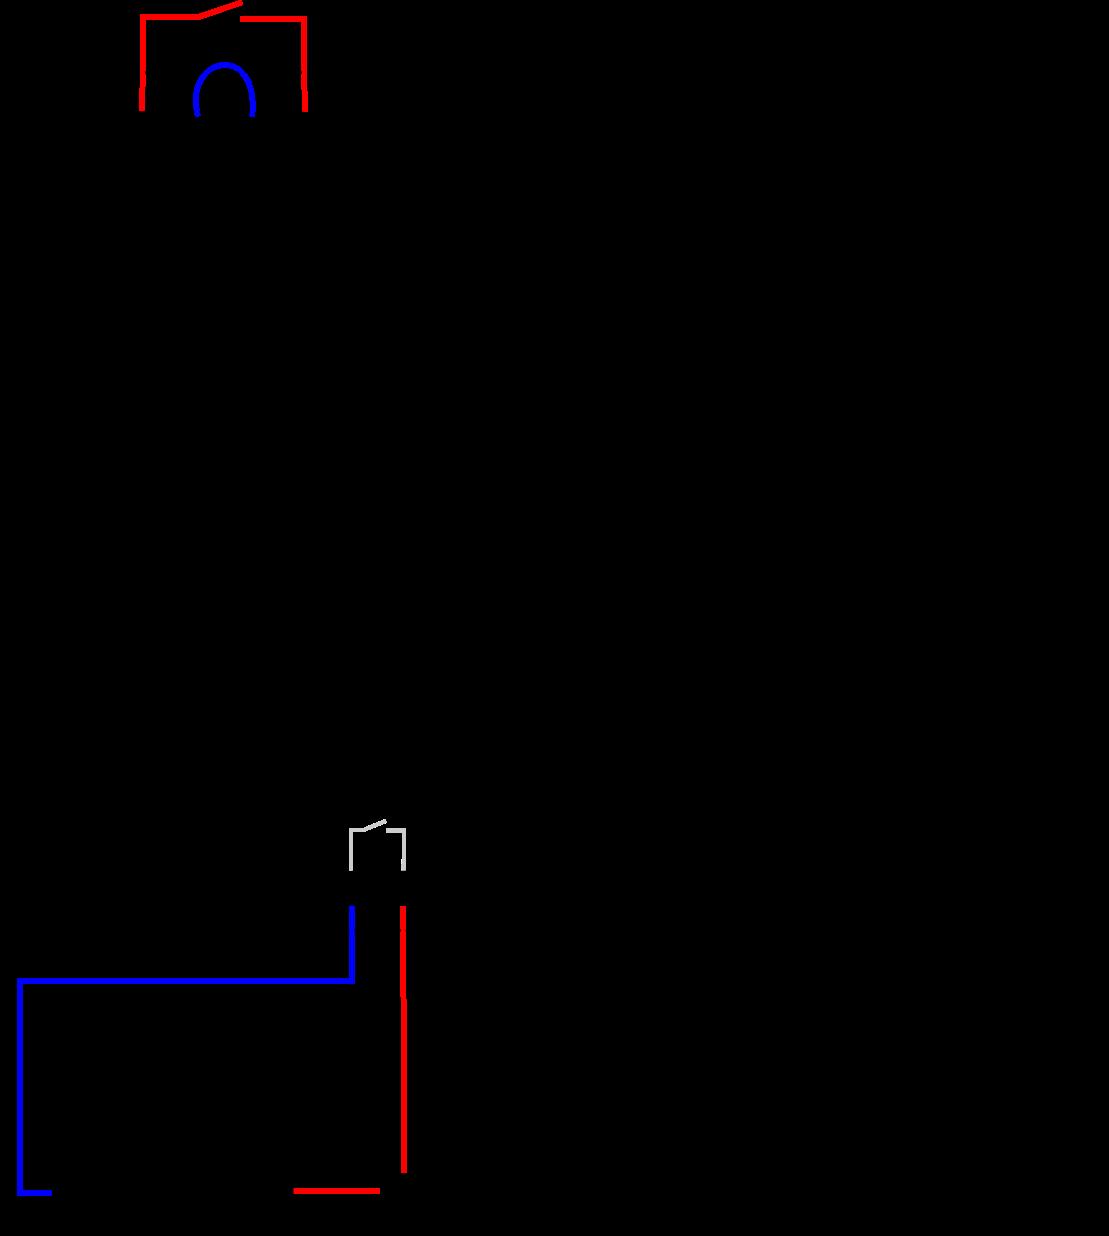 Micrologix 1100 Wiring Diagram Books Of Ab Plc We Do Controls Programming 1 Rh Wedocontrols Blogspot Com